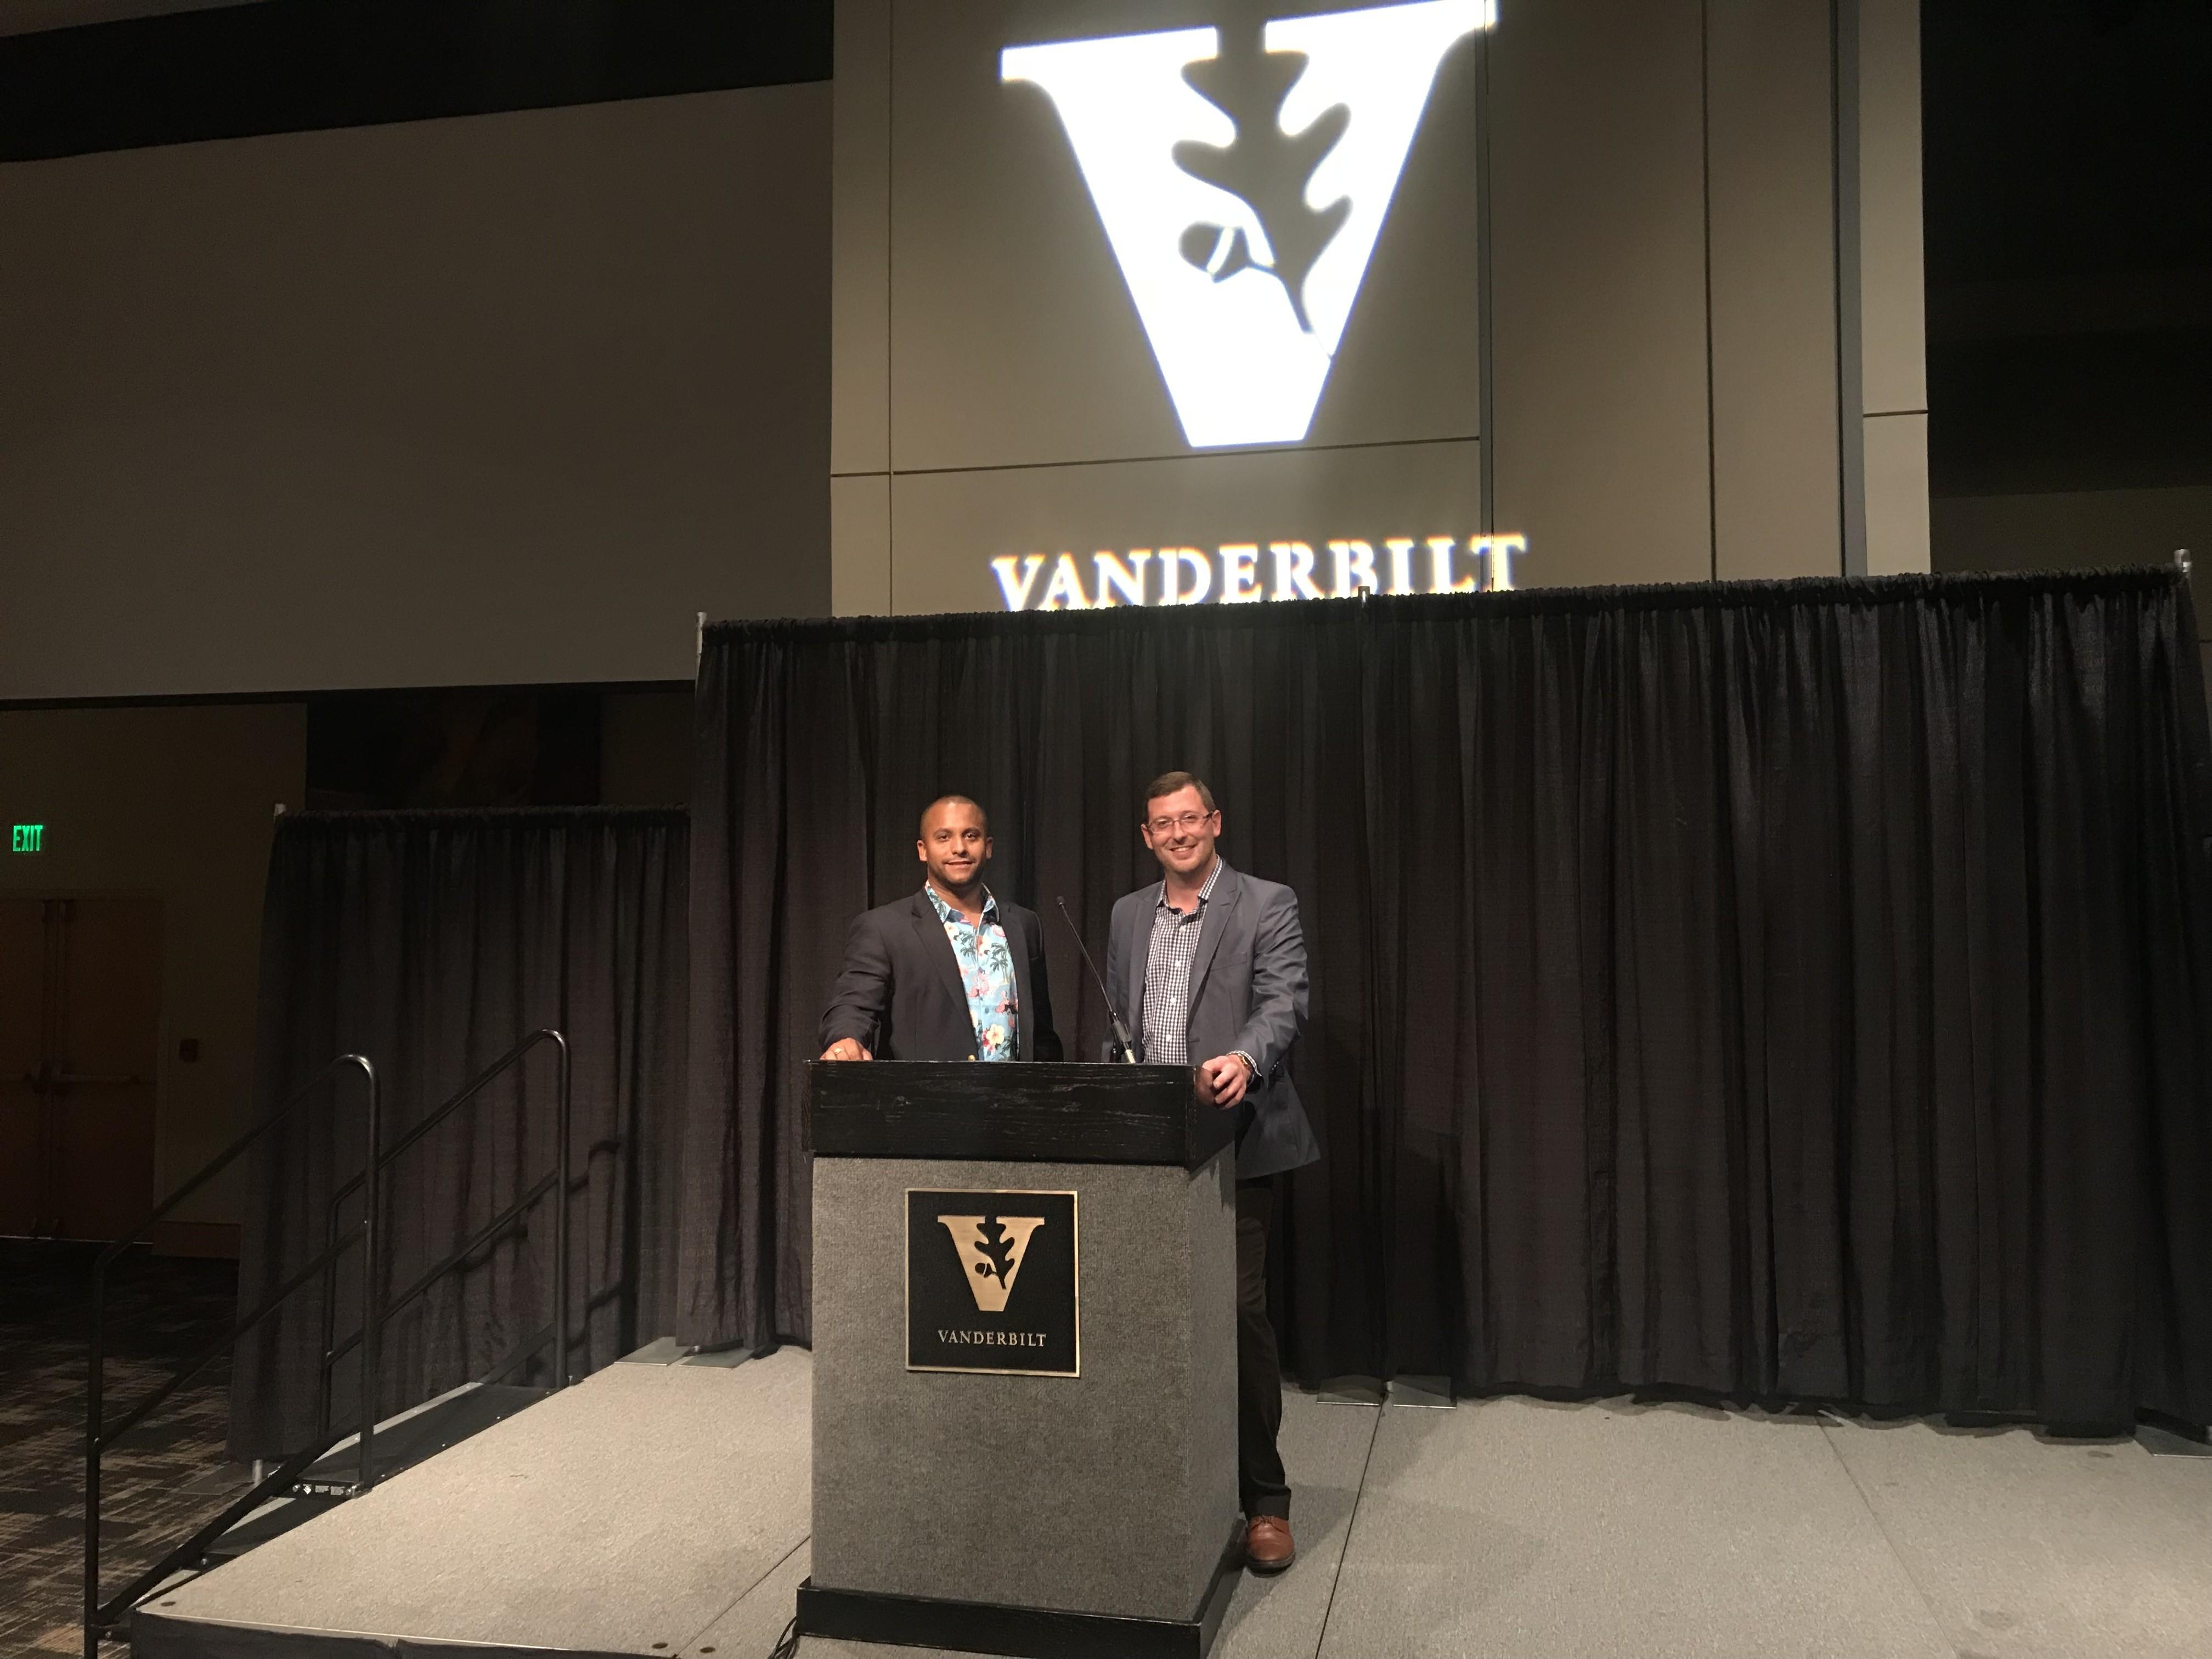 MaxxContent and Vanderbilt's Business School Collaboration